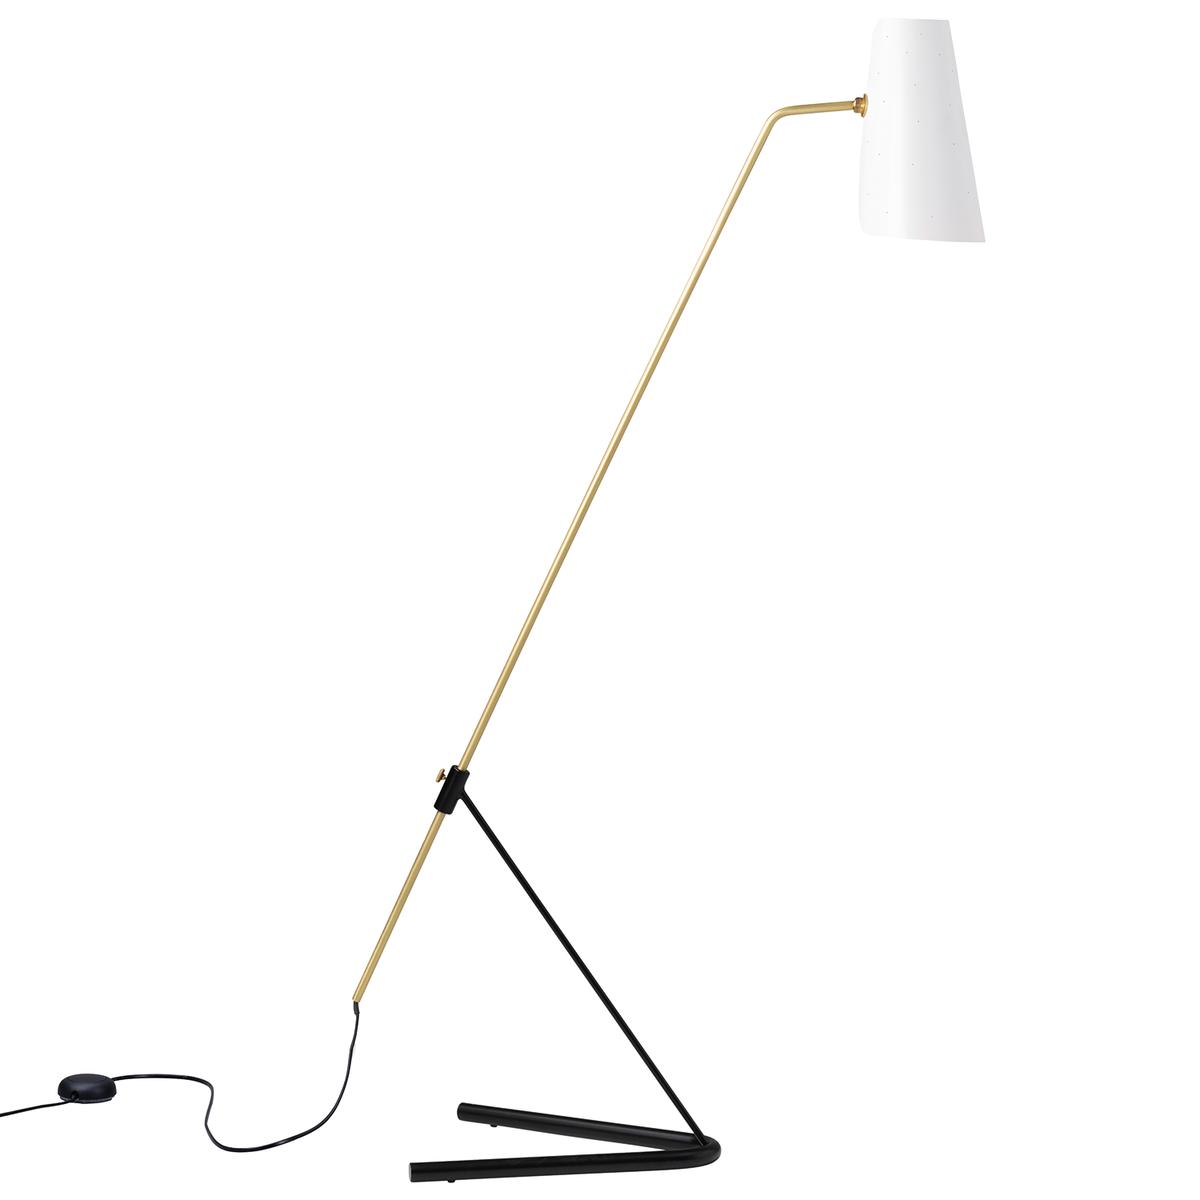 Sammode G21 Floor Lamp, Perforated White